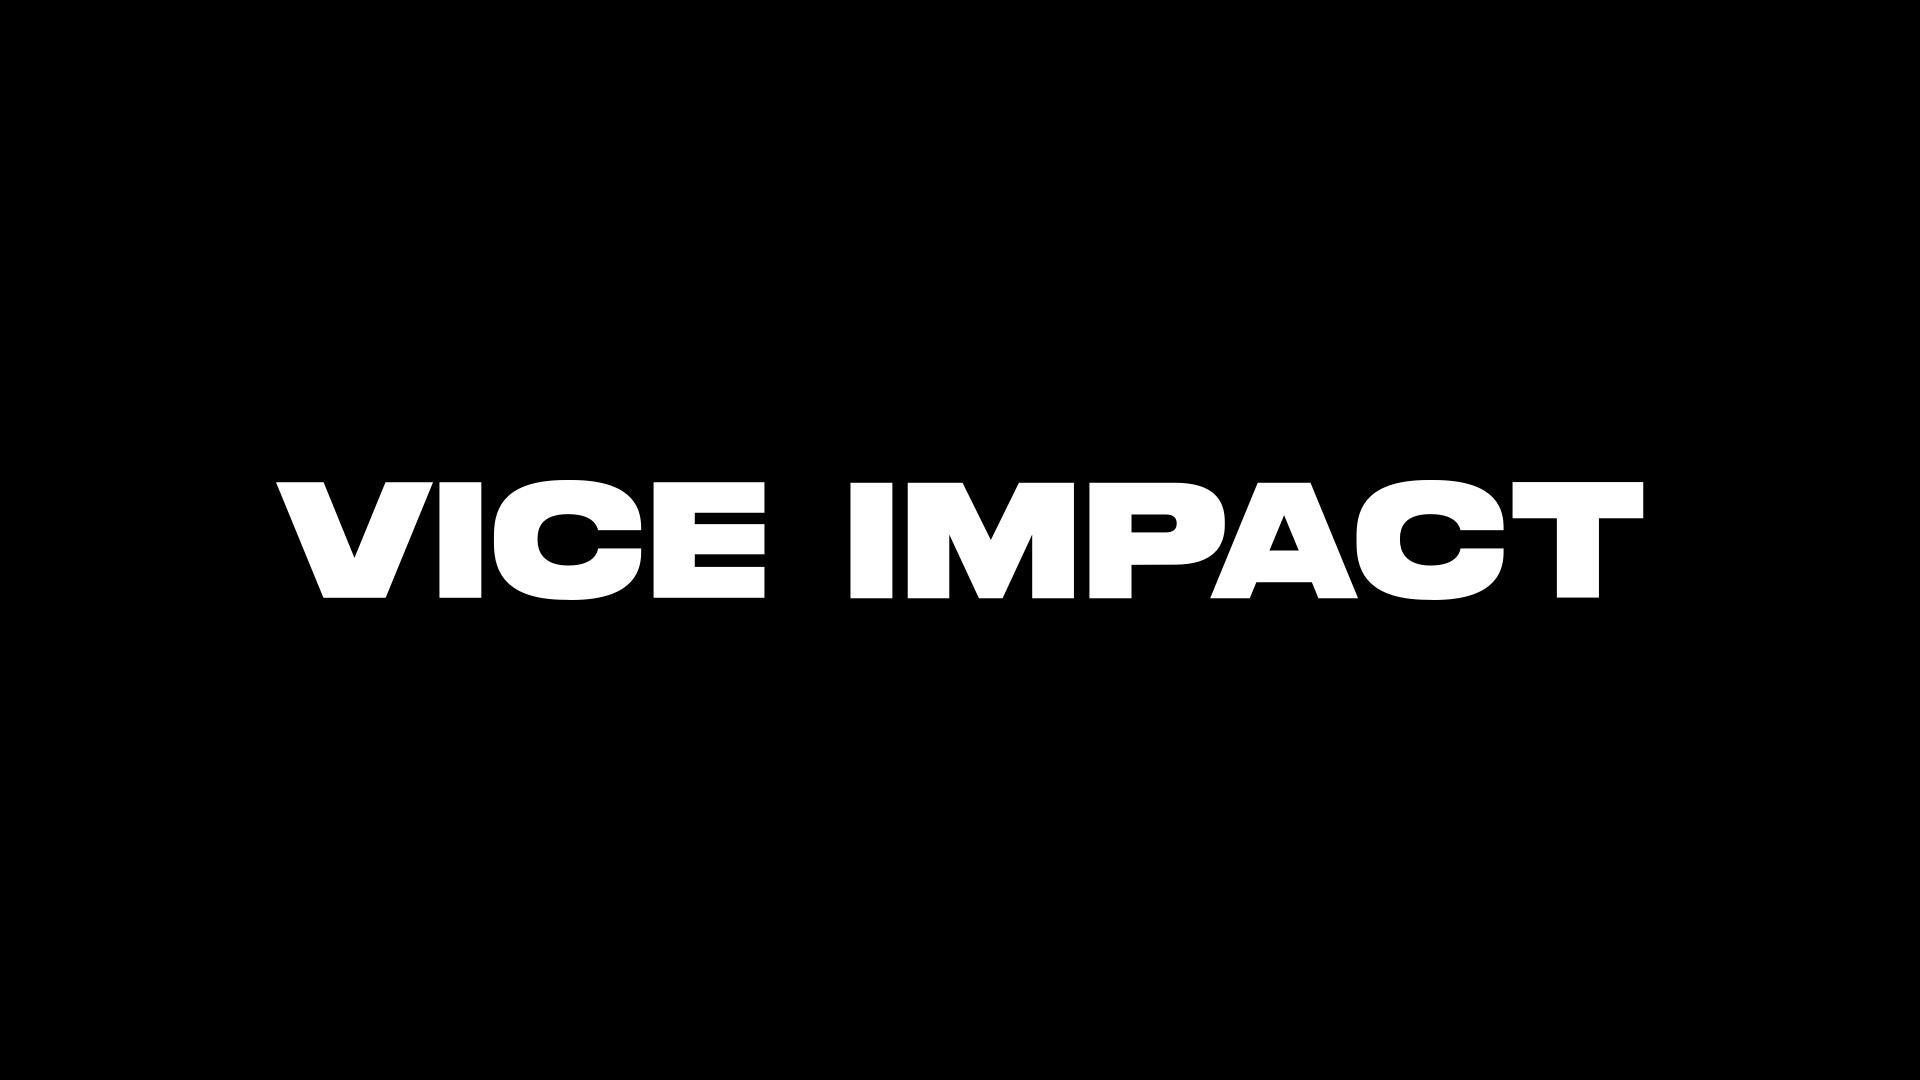 impact-og.png.jpeg